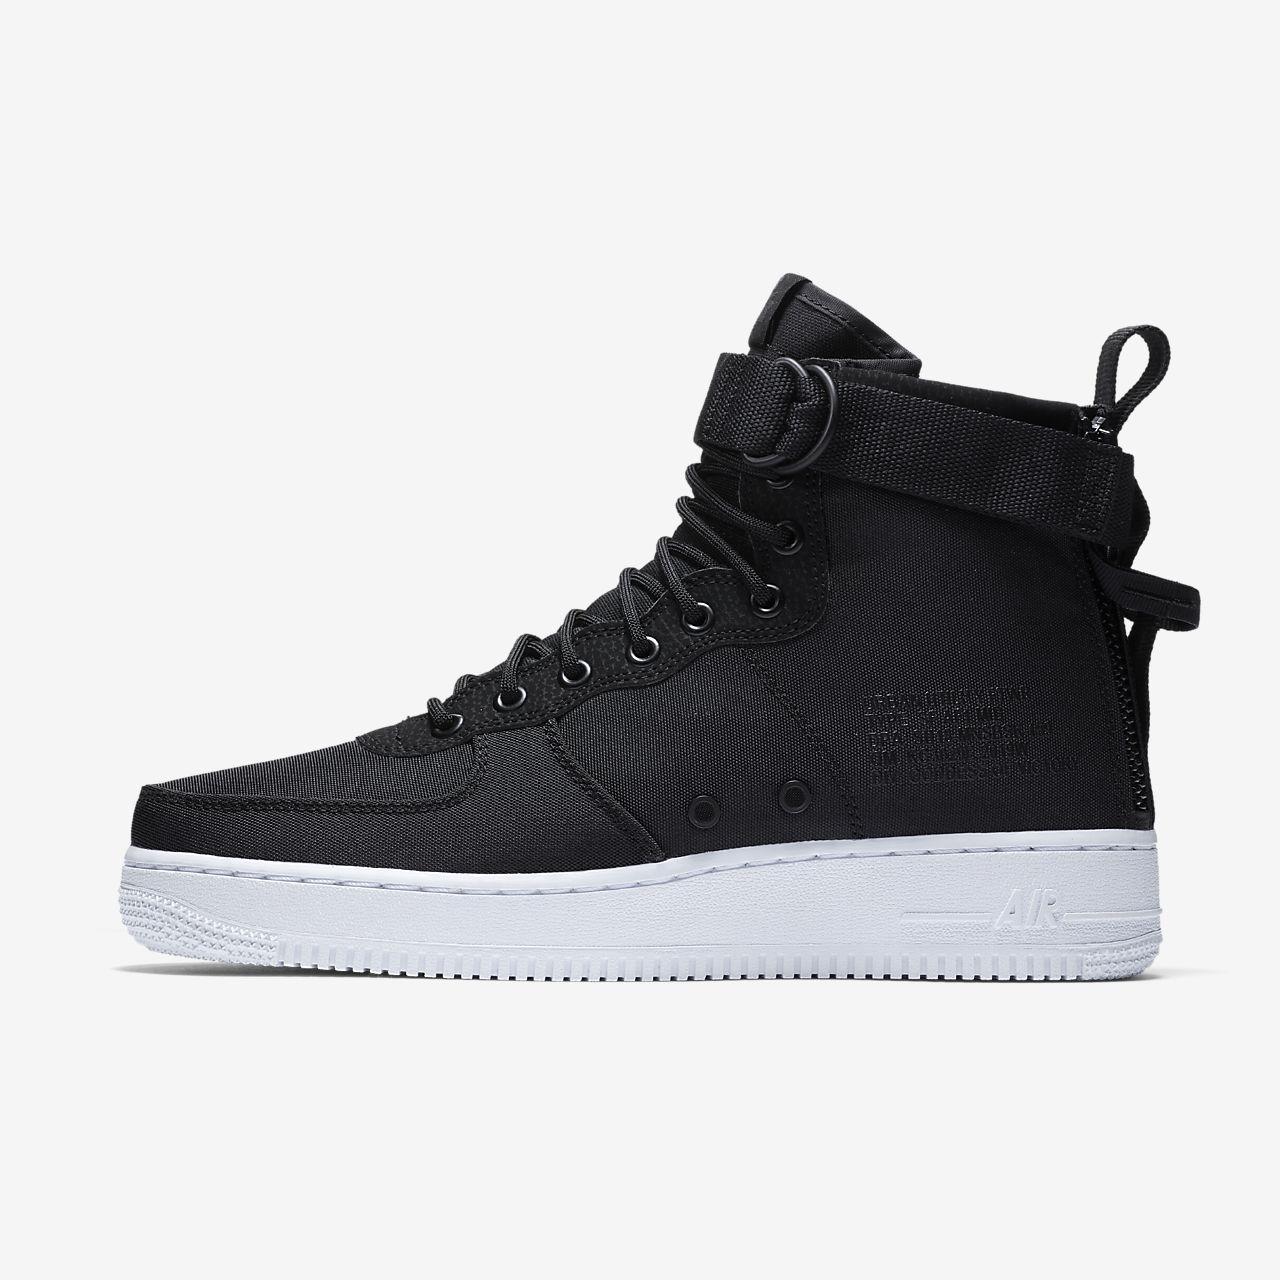 nike sf air force 1 mid shoe